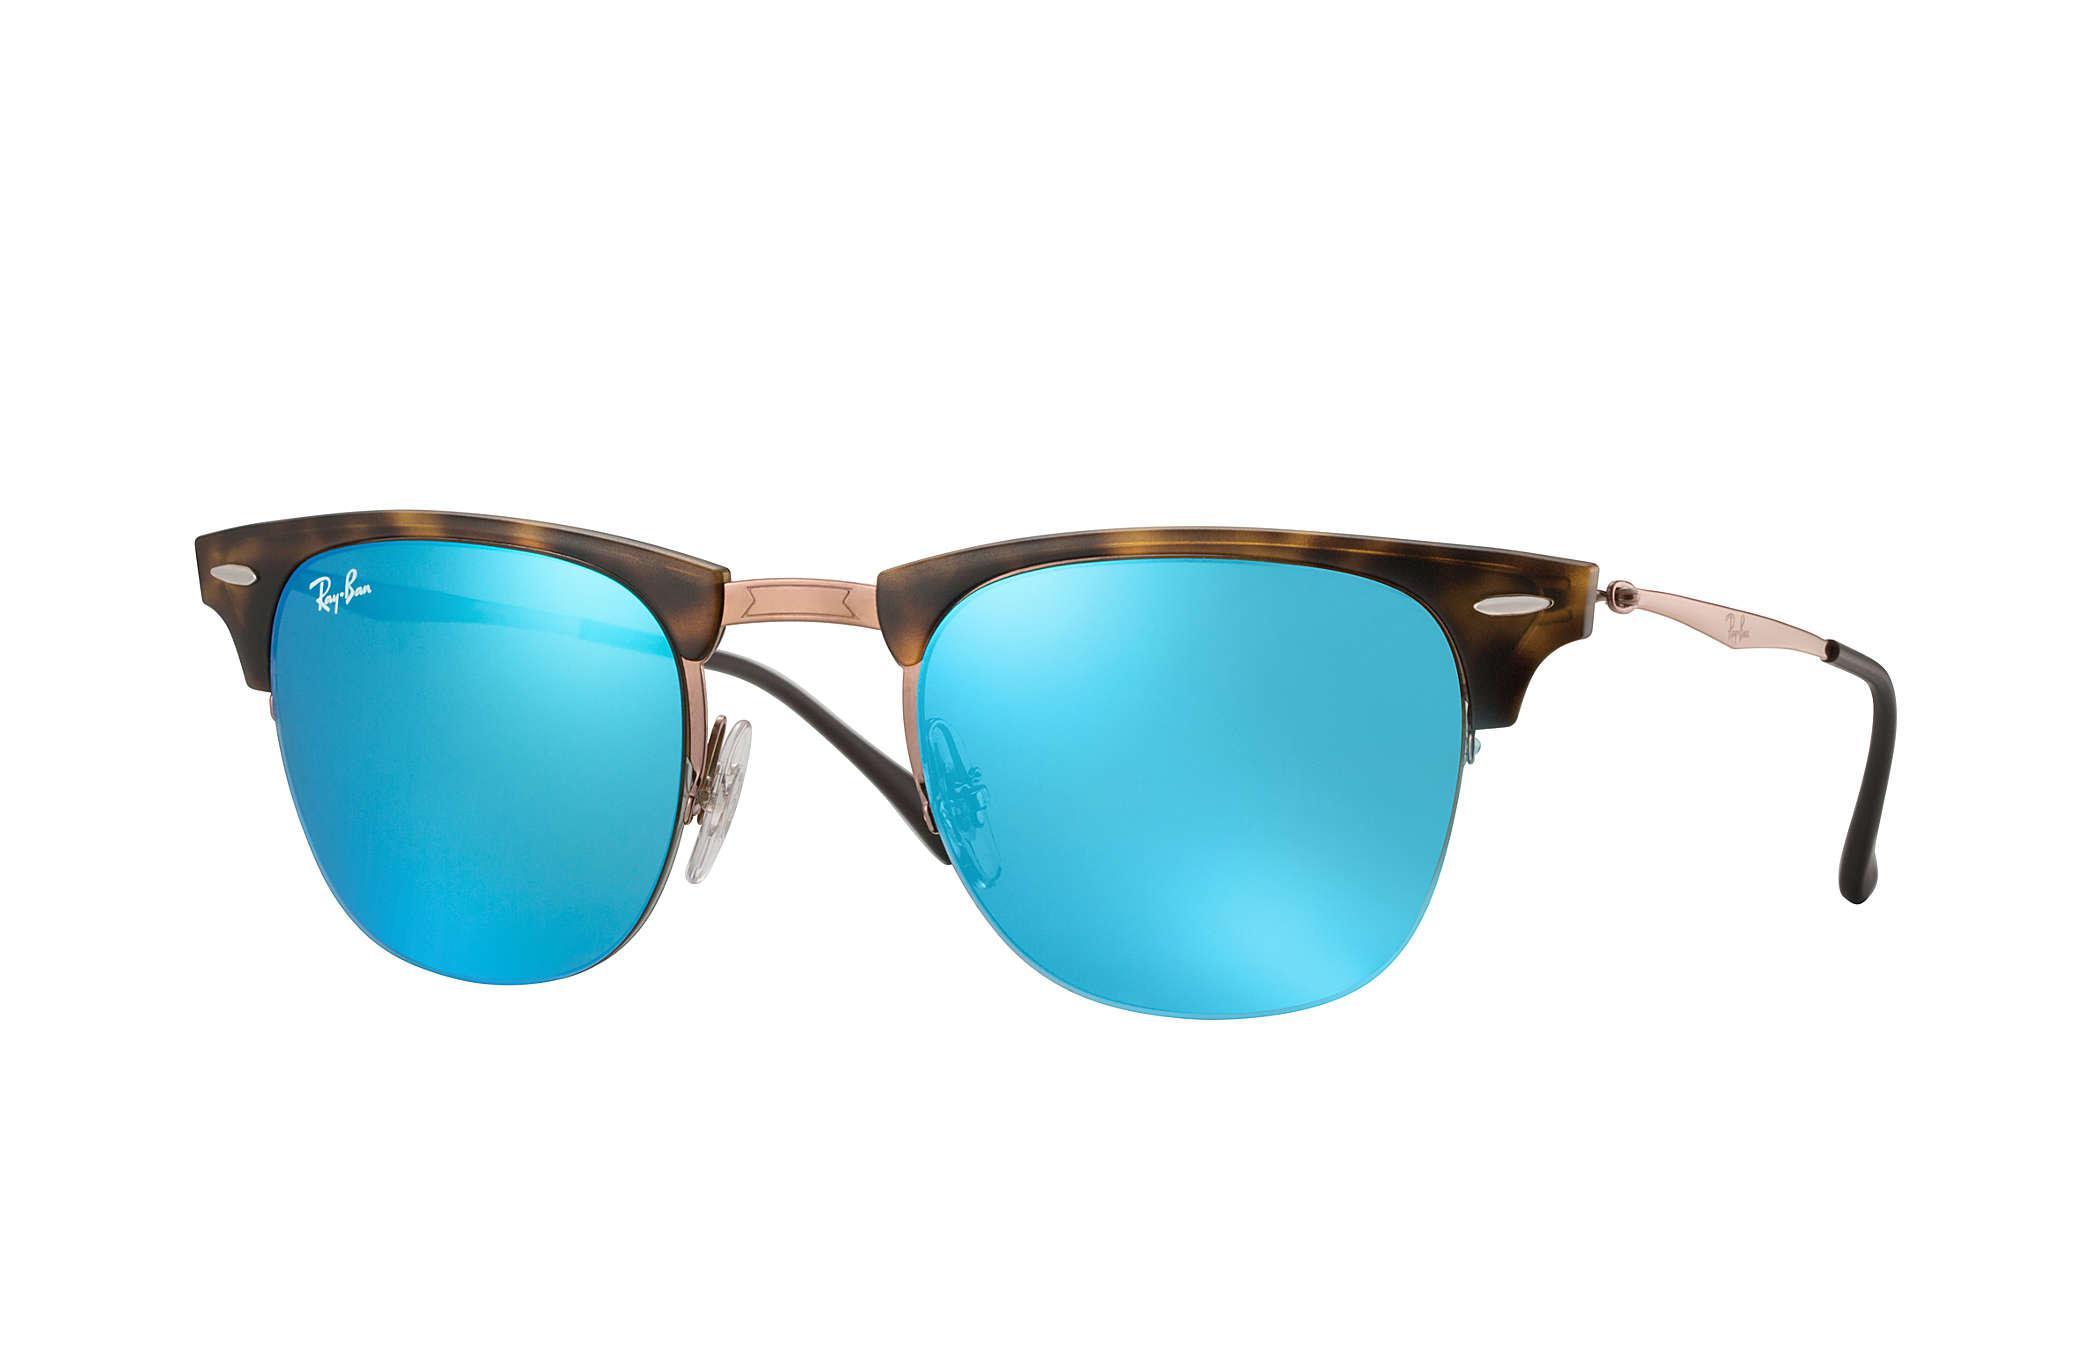 5908b6aa02 Ray Ban Rb3026 Blue   Gold Aviator Pilot Sunglasses « One More Soul